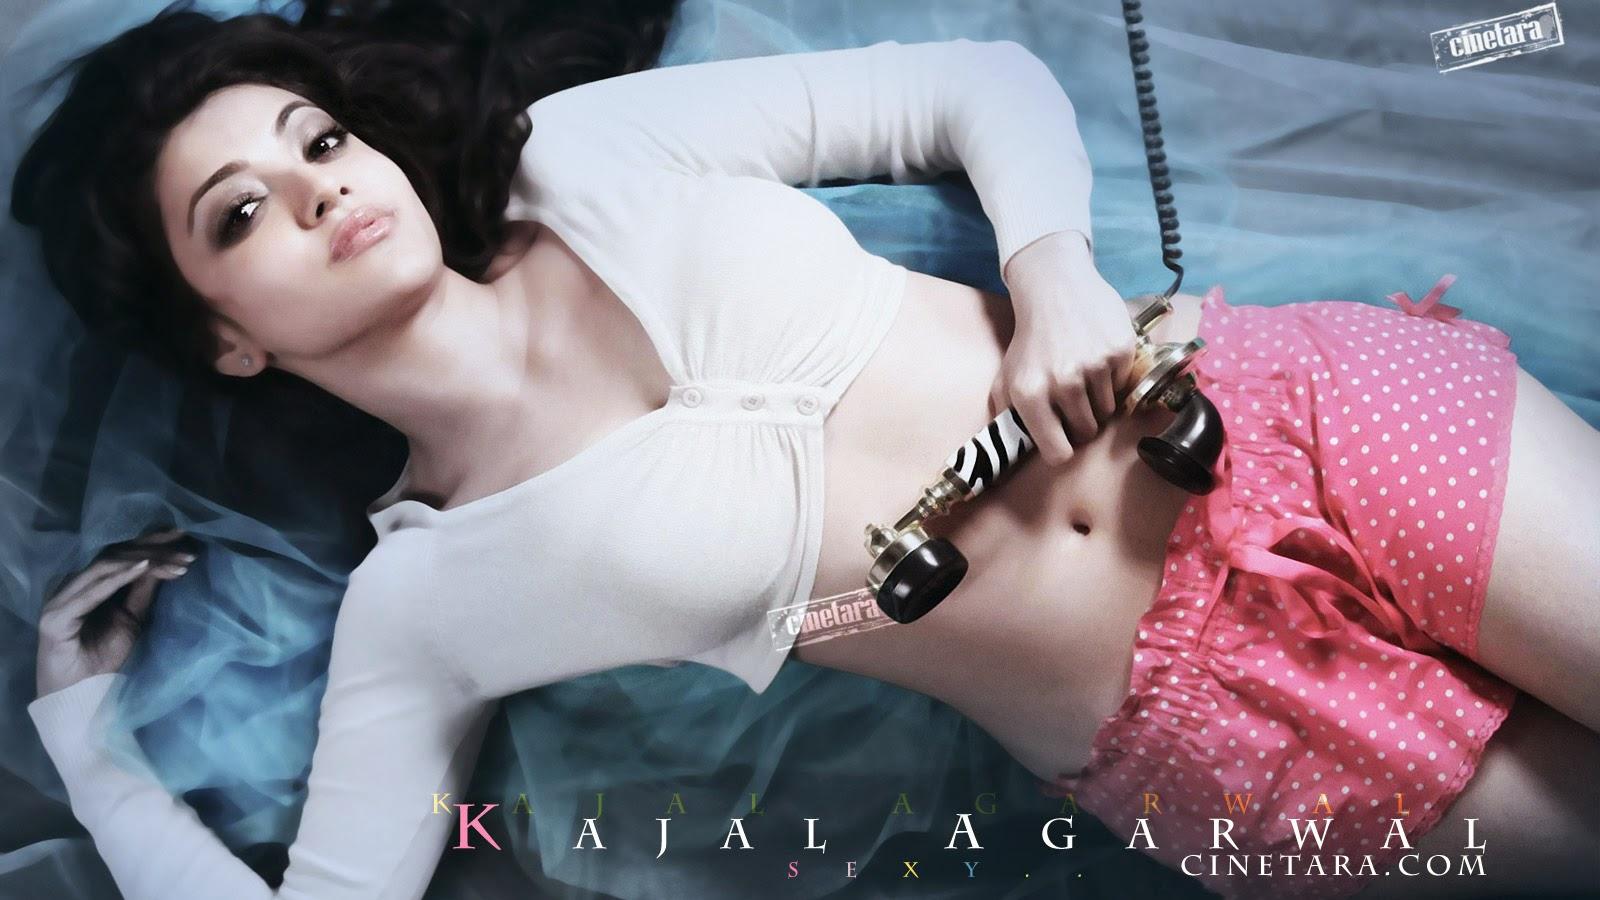 Kajal agarwal sexy scene